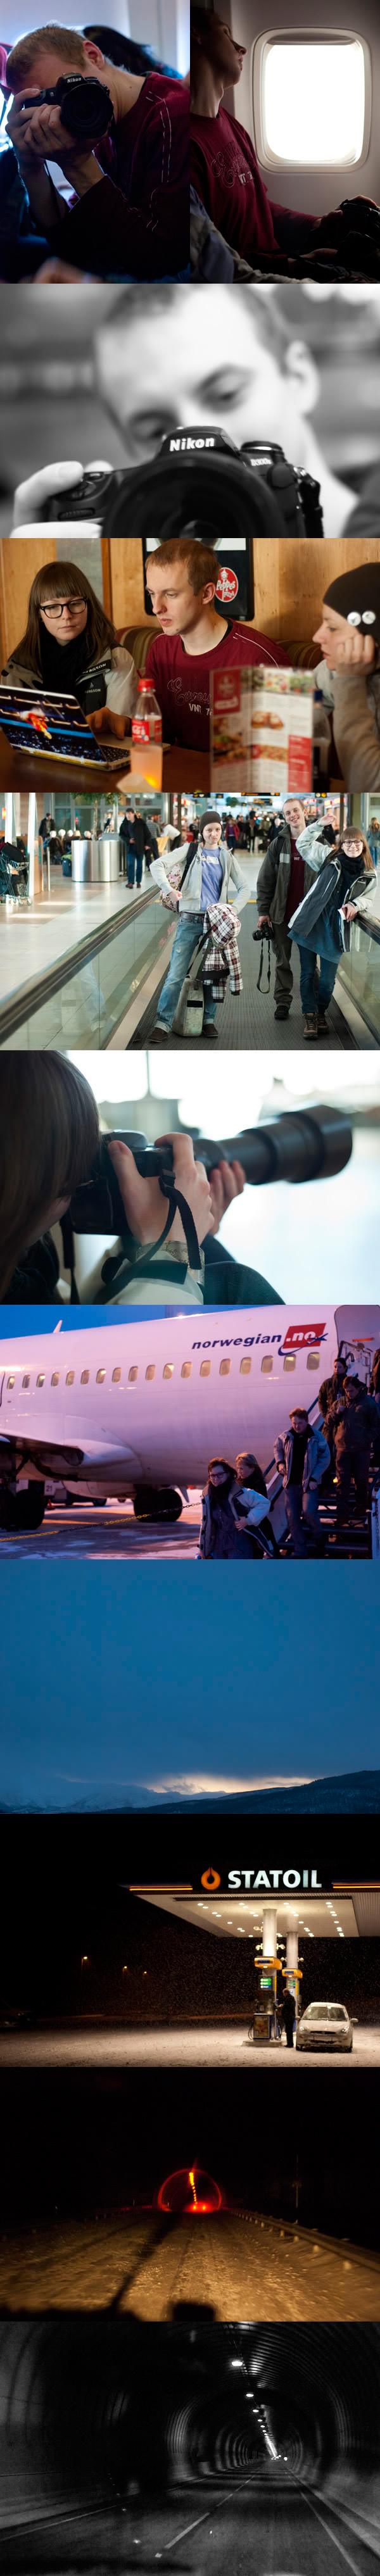 Samolot, airplane, Norwegia, Norway, Szkola, School, Stypendium, Travel, Podroz.